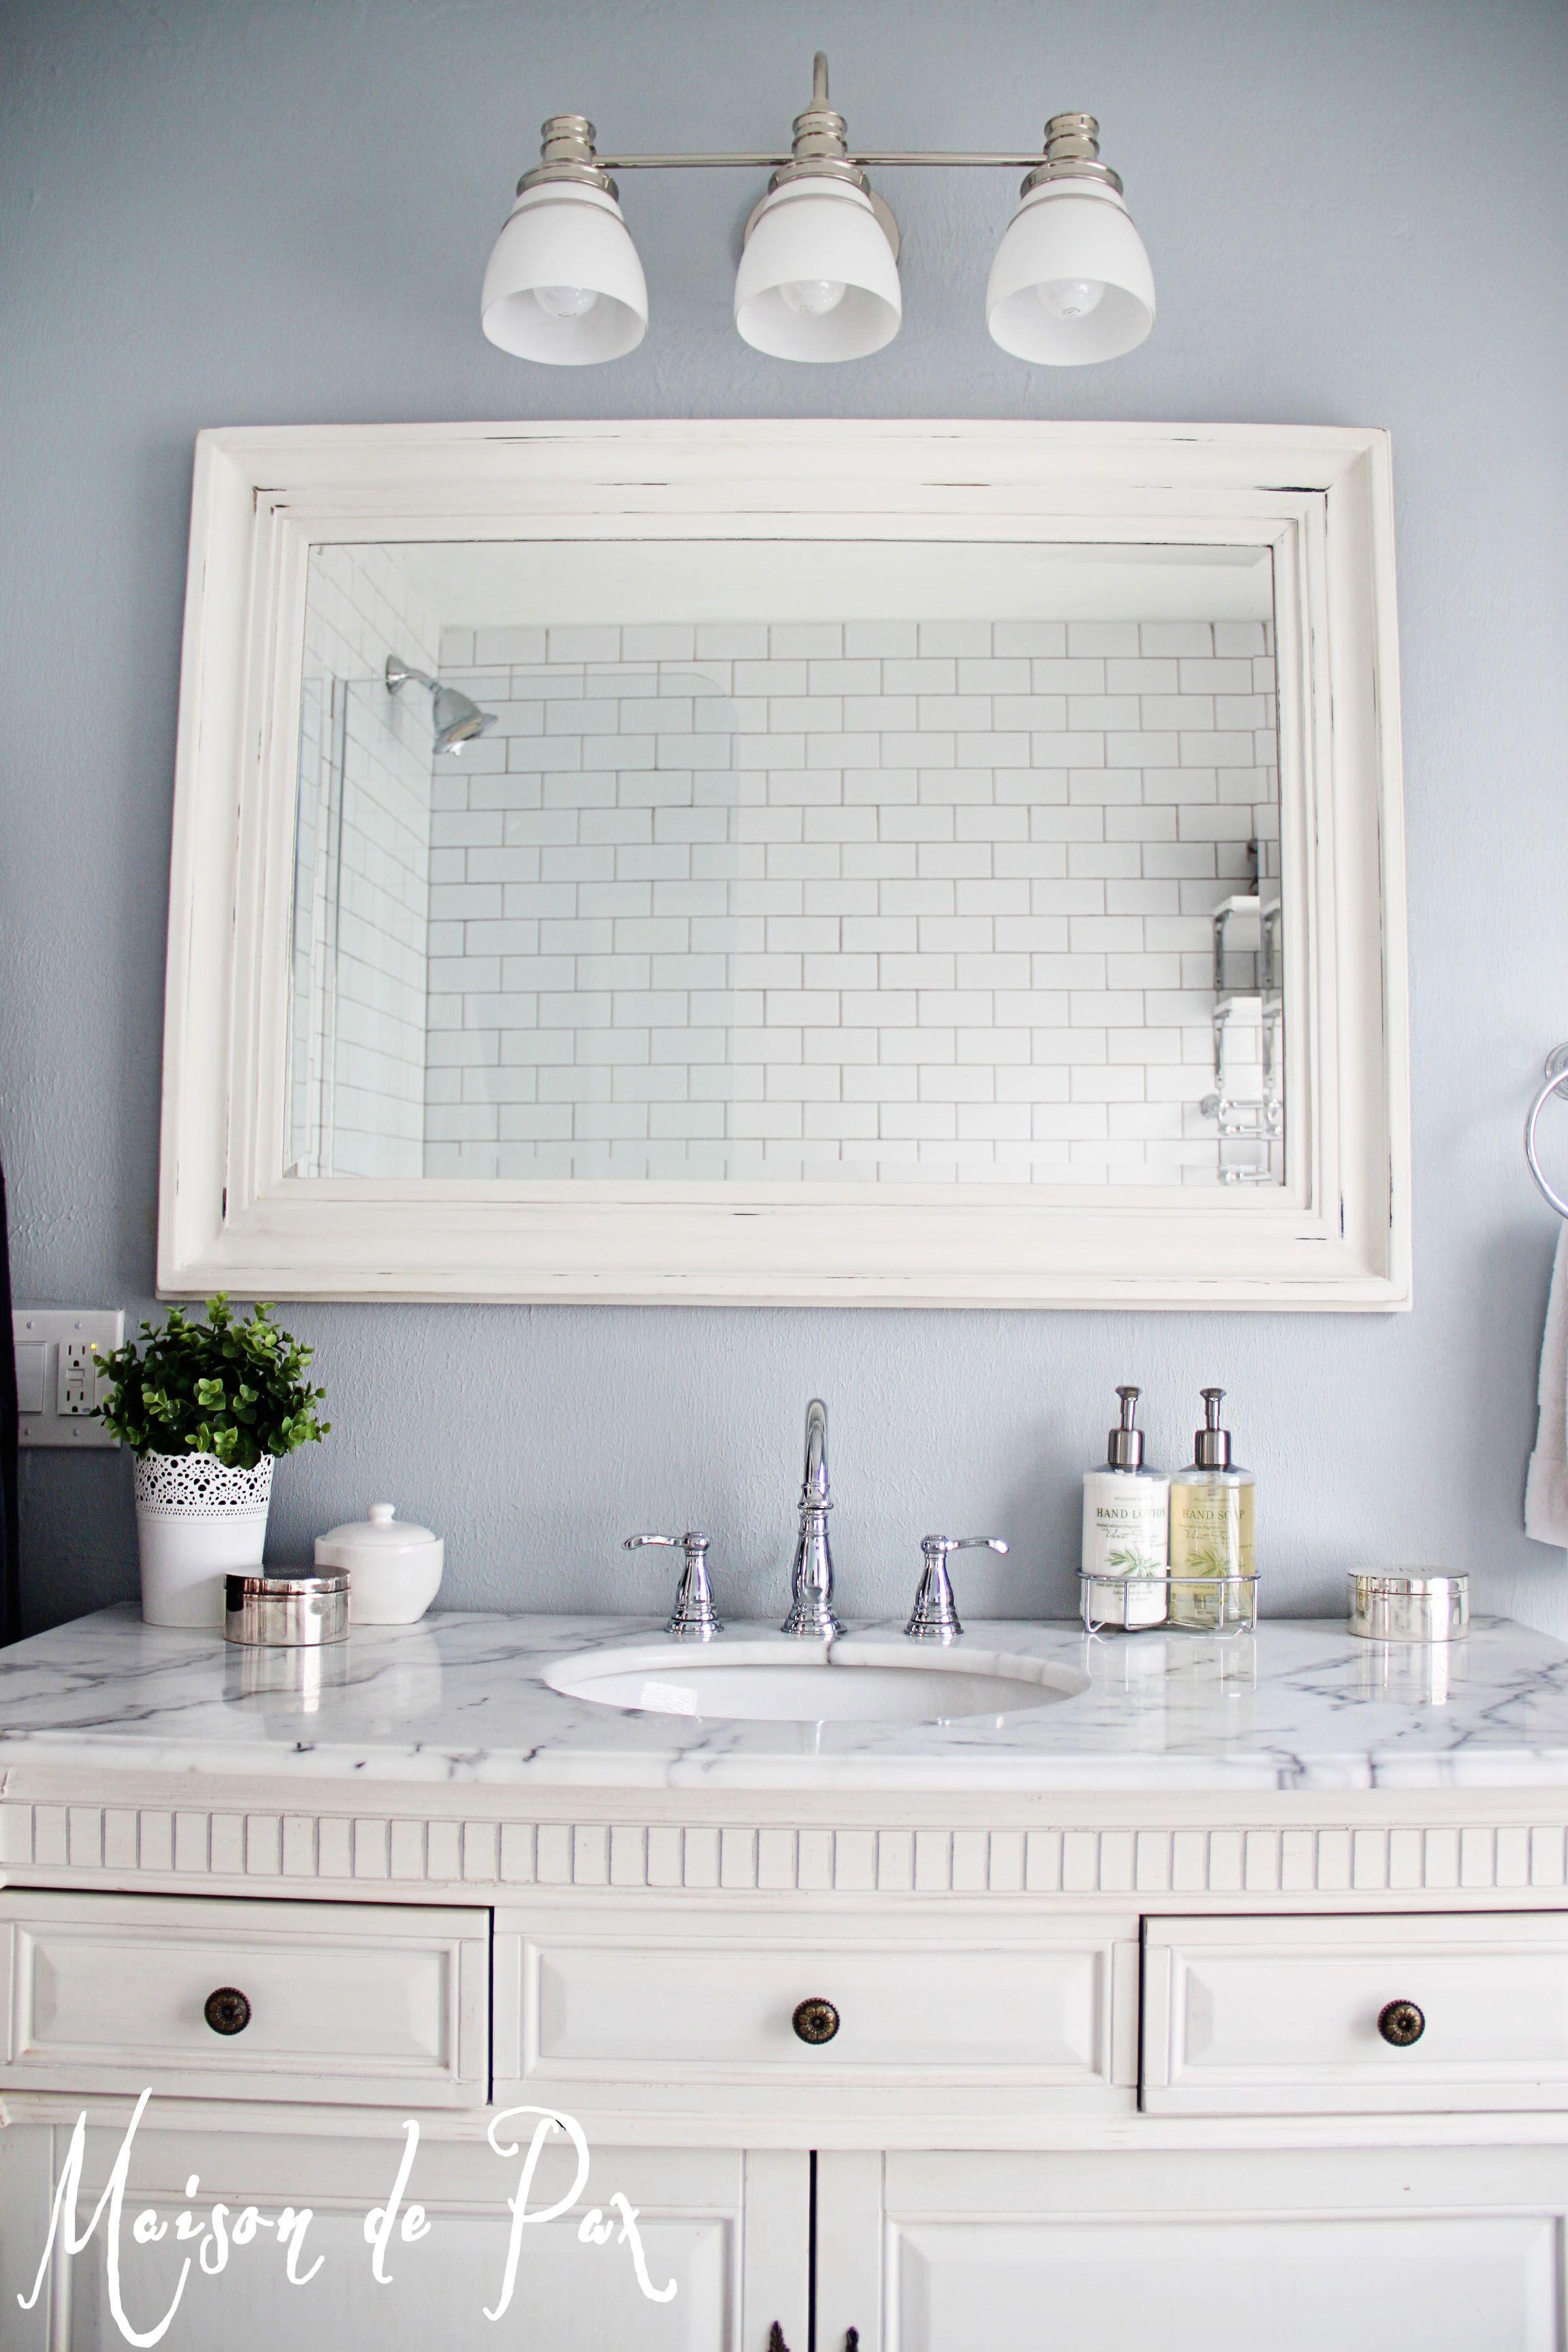 10 Tips for Designing a Small Bathroom | Master bath ...